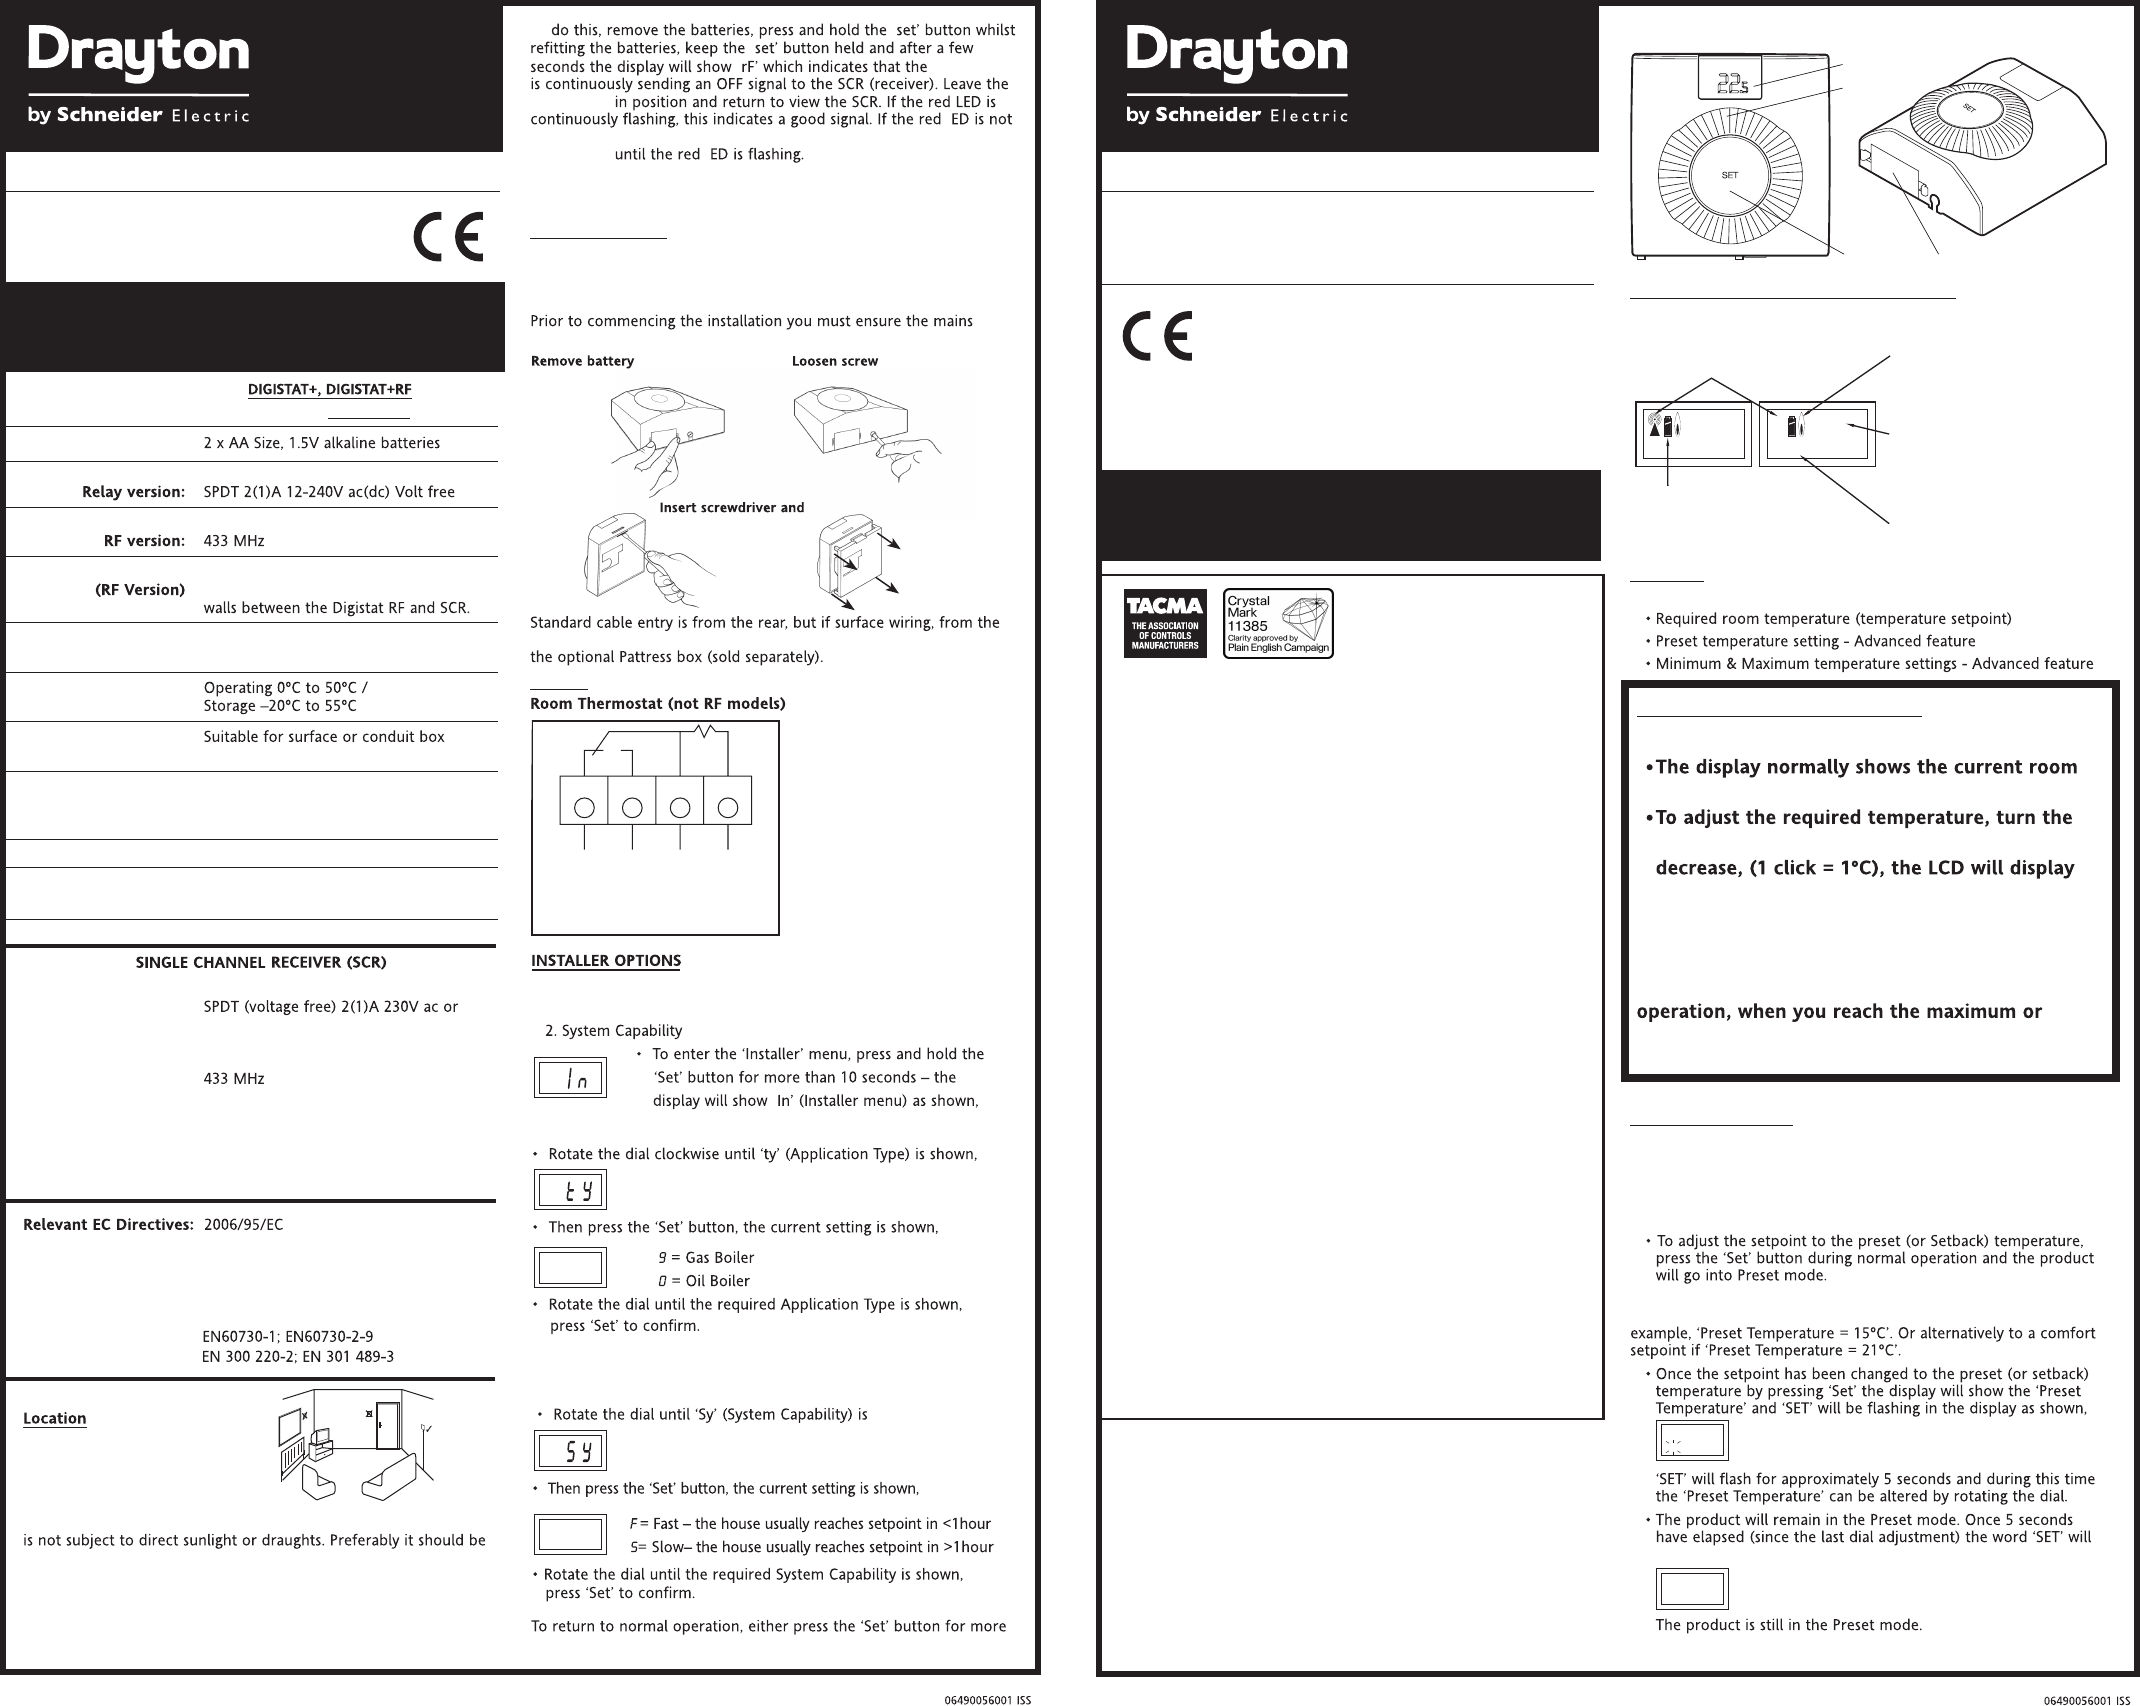 Fantastic Handleiding Drayton Digistat Plus 30002 Rf601 Pagina 2 Van 2 Wiring Database Denligelartorg